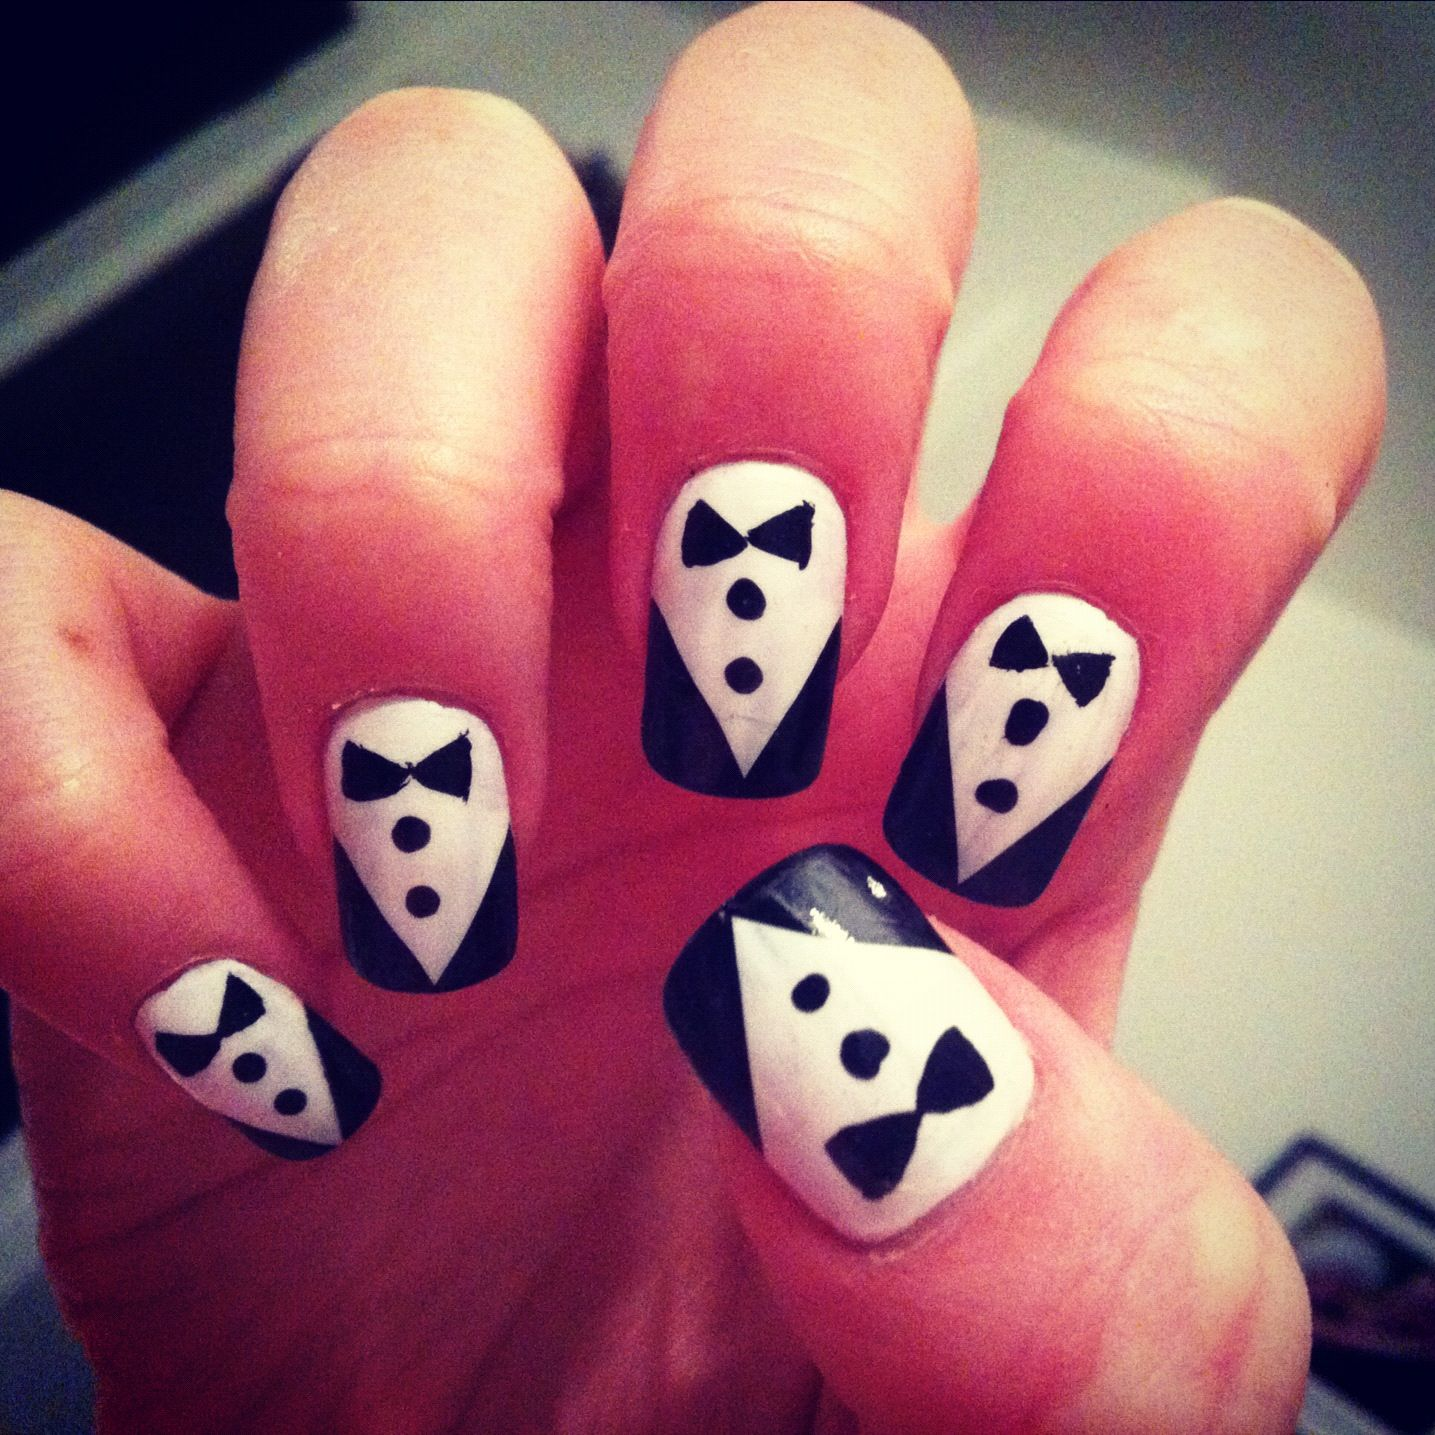 Cute nail designs easy do yourself google search gotta do the cute nail designs easy do yourself google search solutioingenieria Choice Image